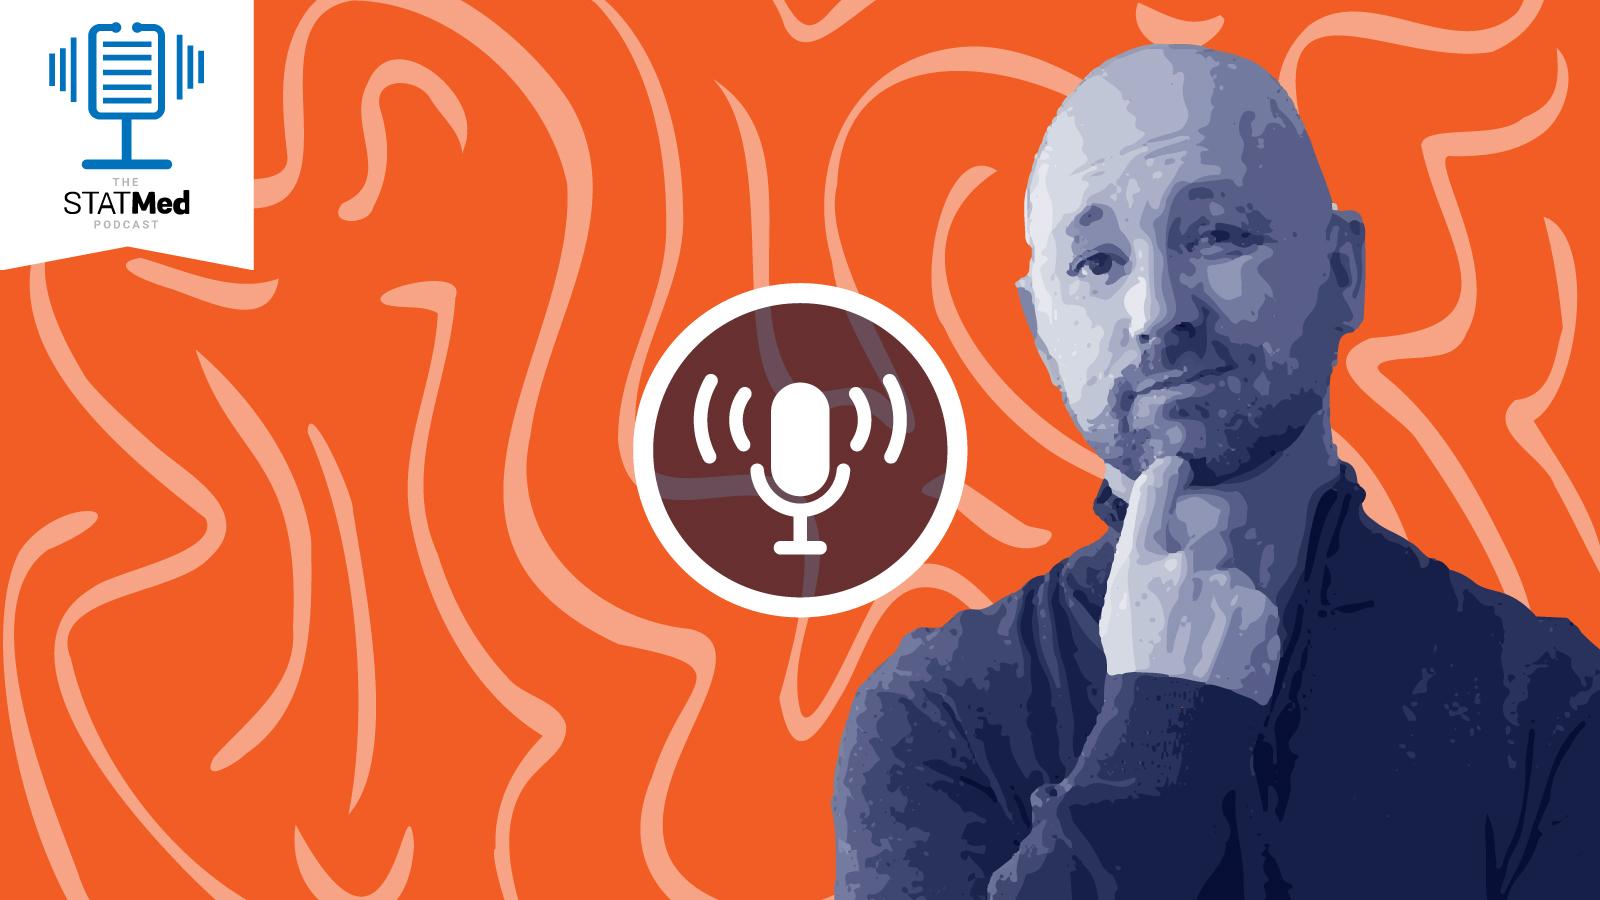 Ryan Orwig ADHD podcast miniseries